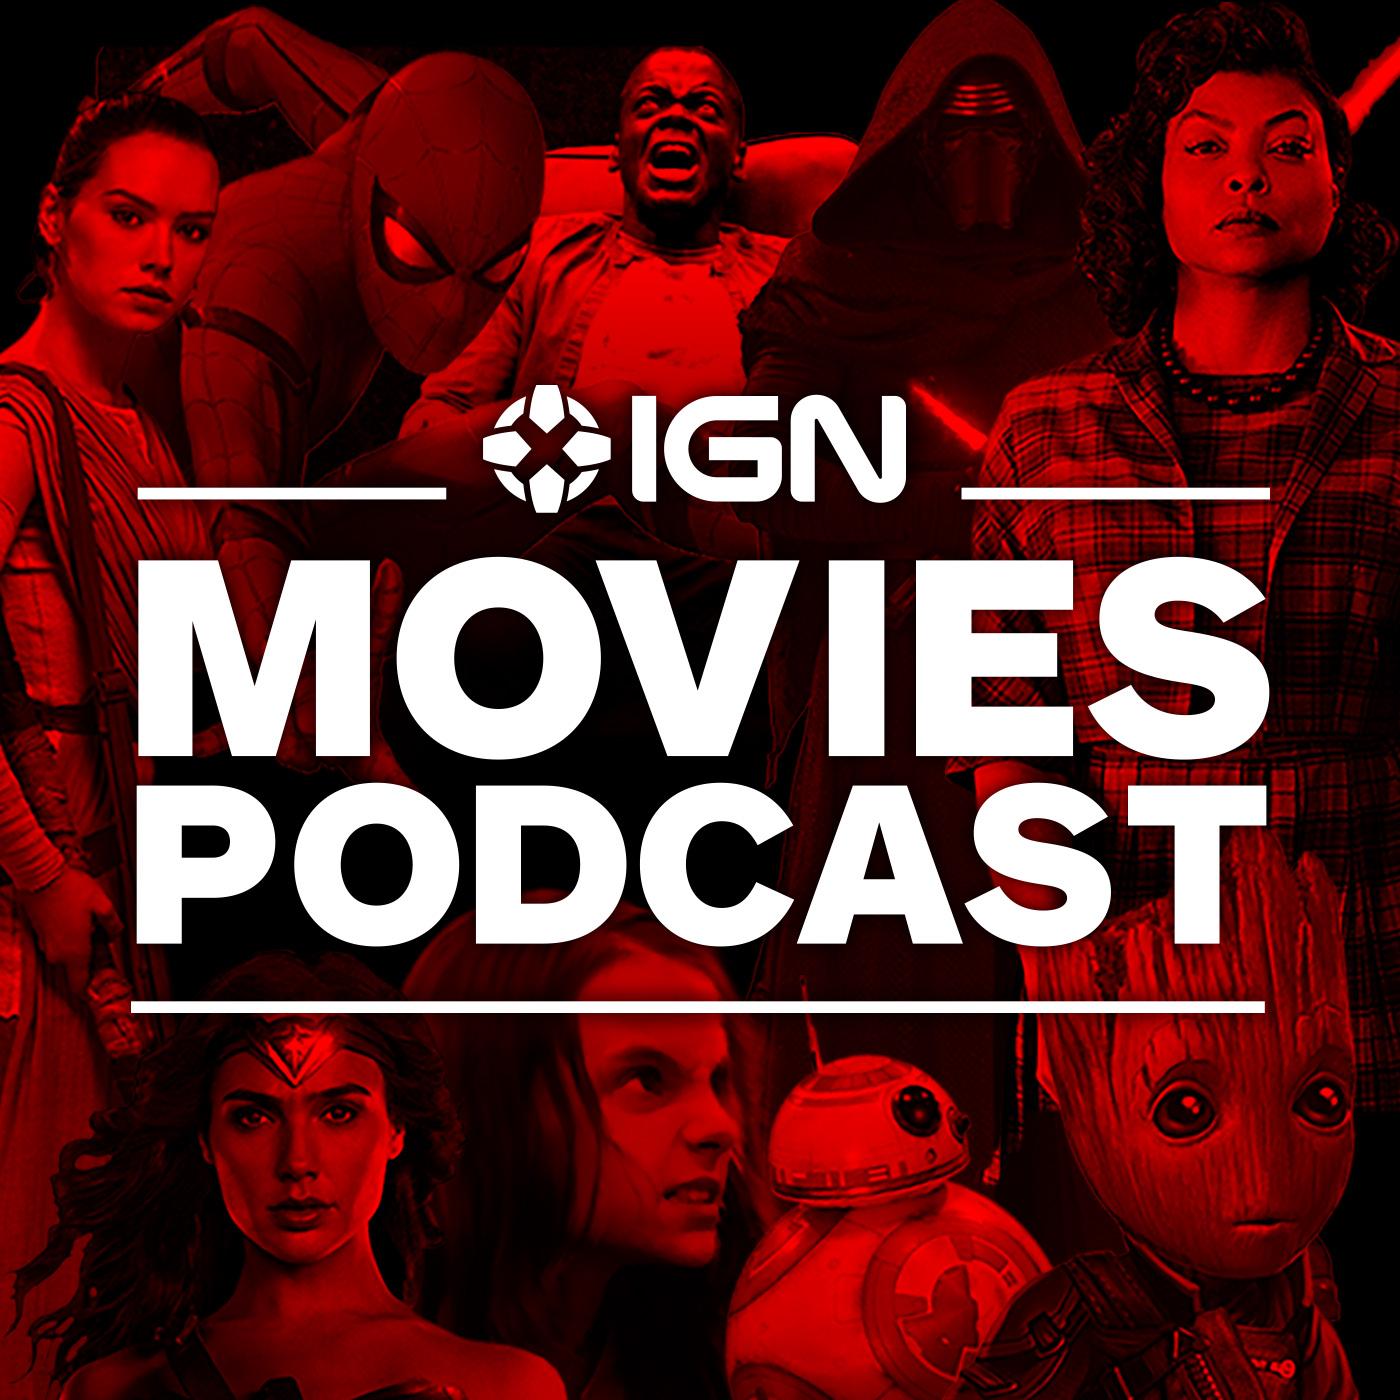 IGN Movies Podcast, Episode 25: James Bond Casting, Star Trek 4, and Guardians Vol. 3